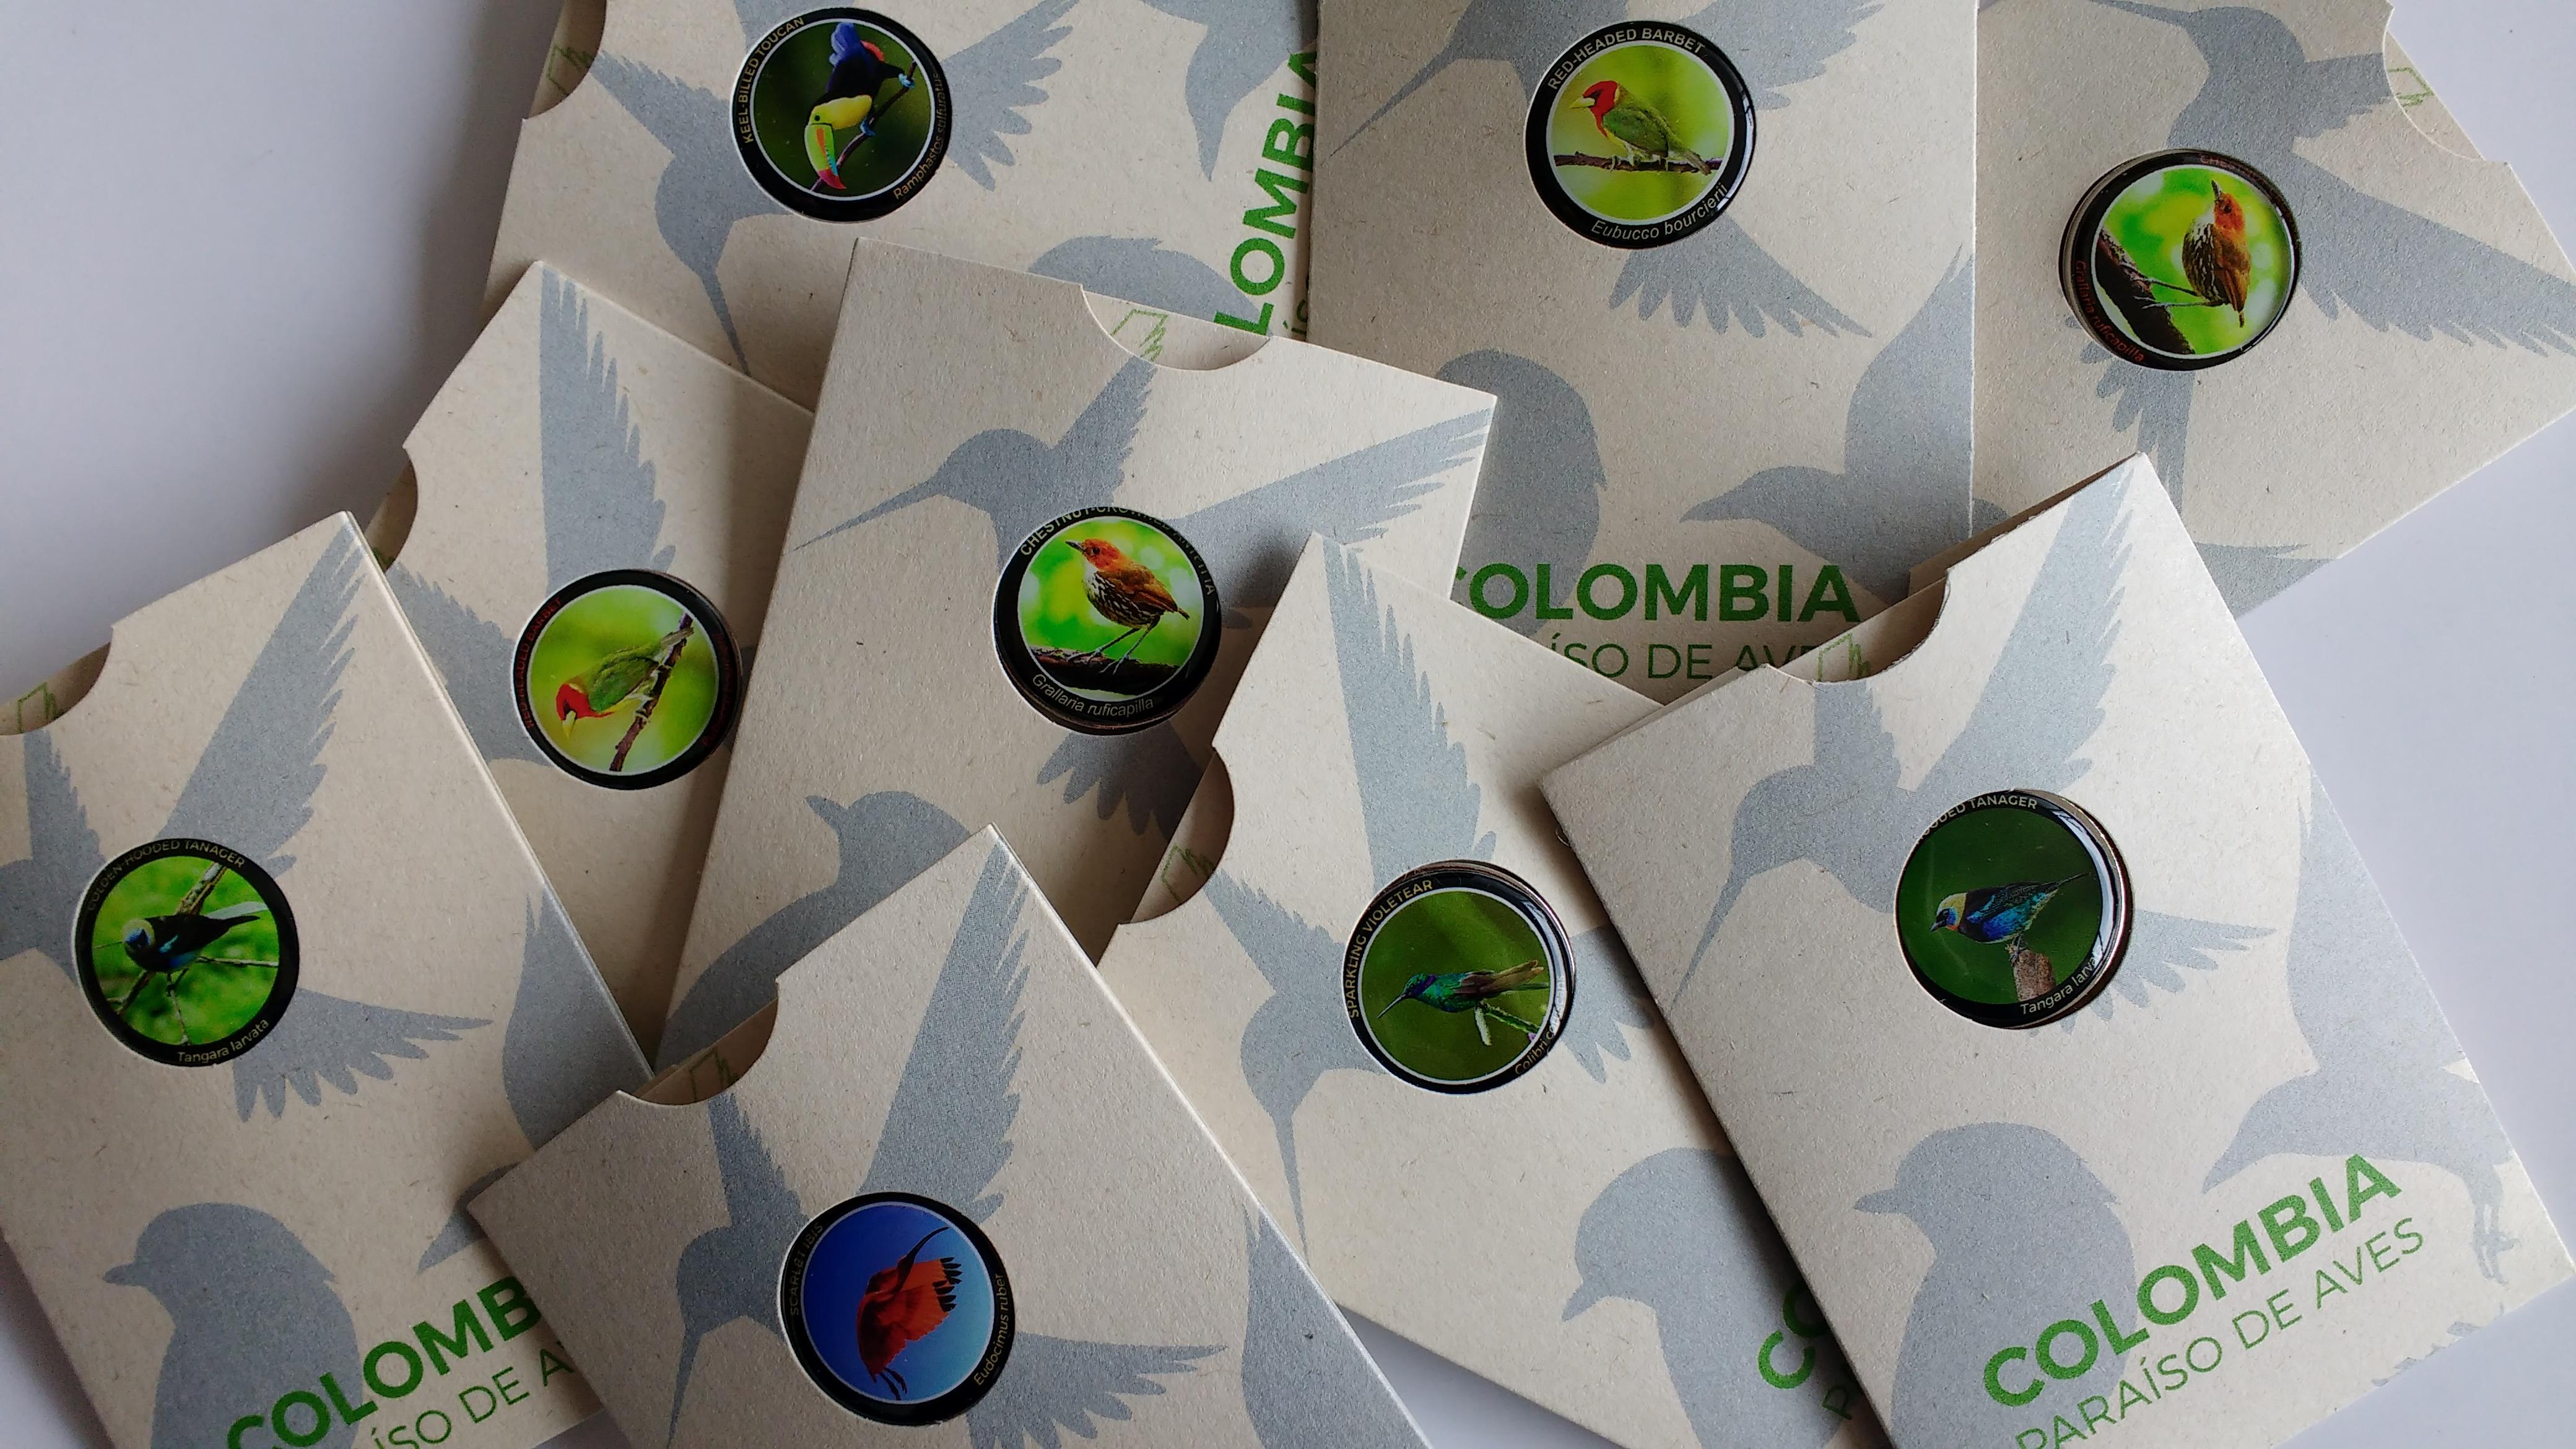 Pines de aves de Colombia